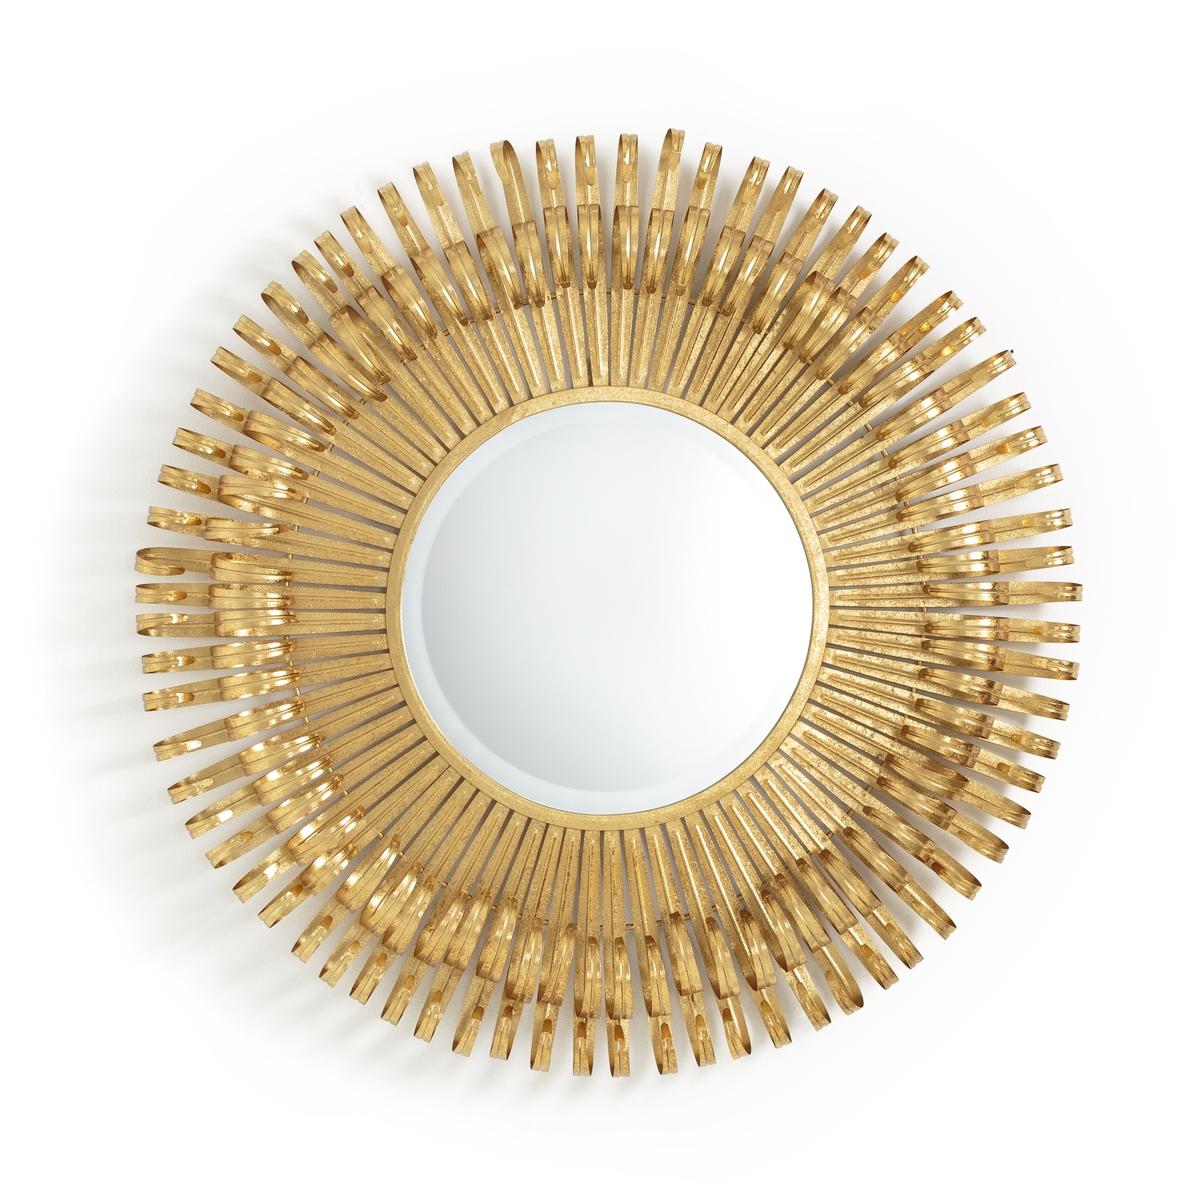 Зеркало в форме солнца Polypous